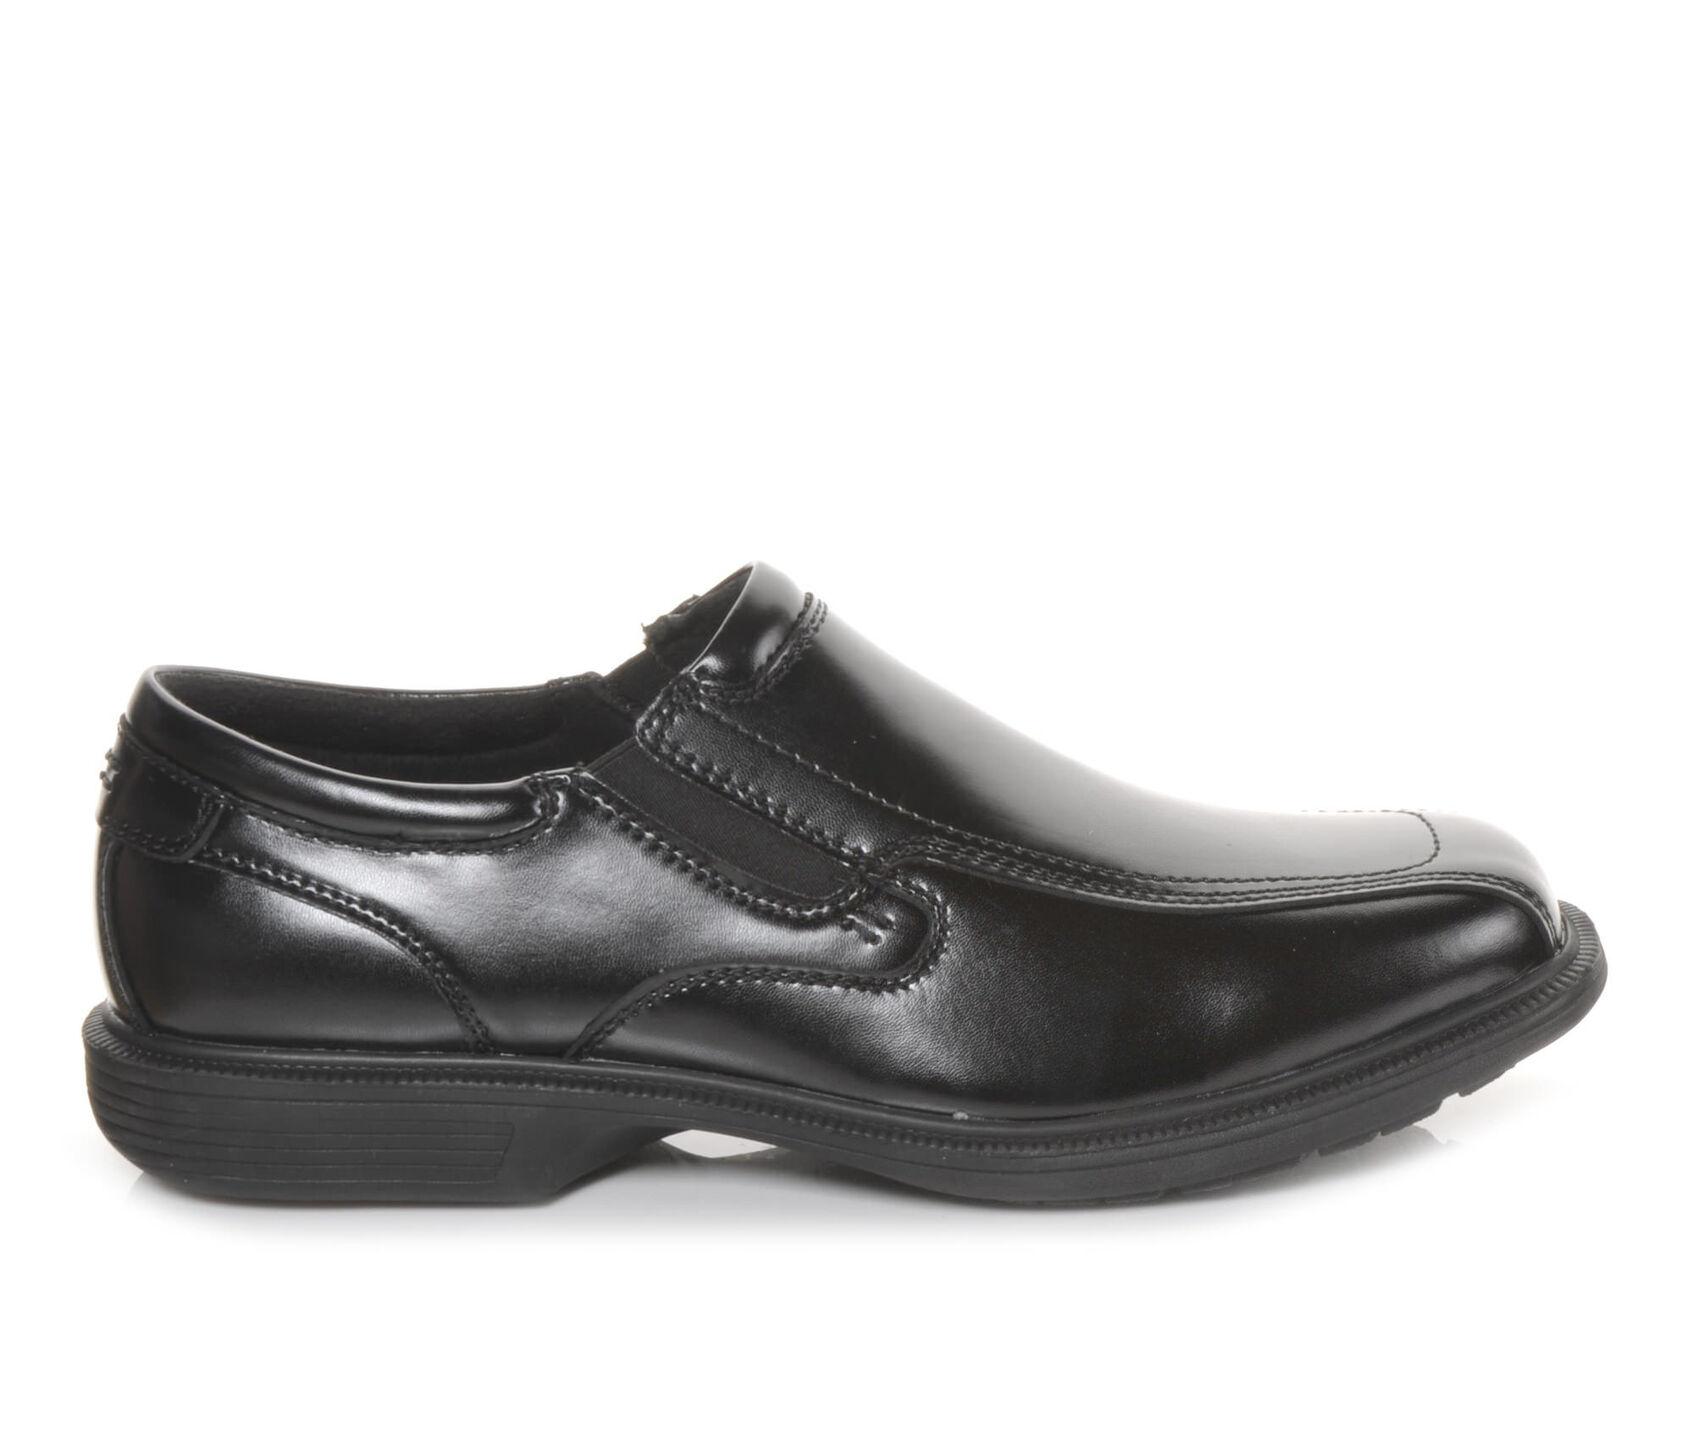 02c4f93731 Men S Nunn Bush Bleeker Street Dress Shoes Shoe Carnival